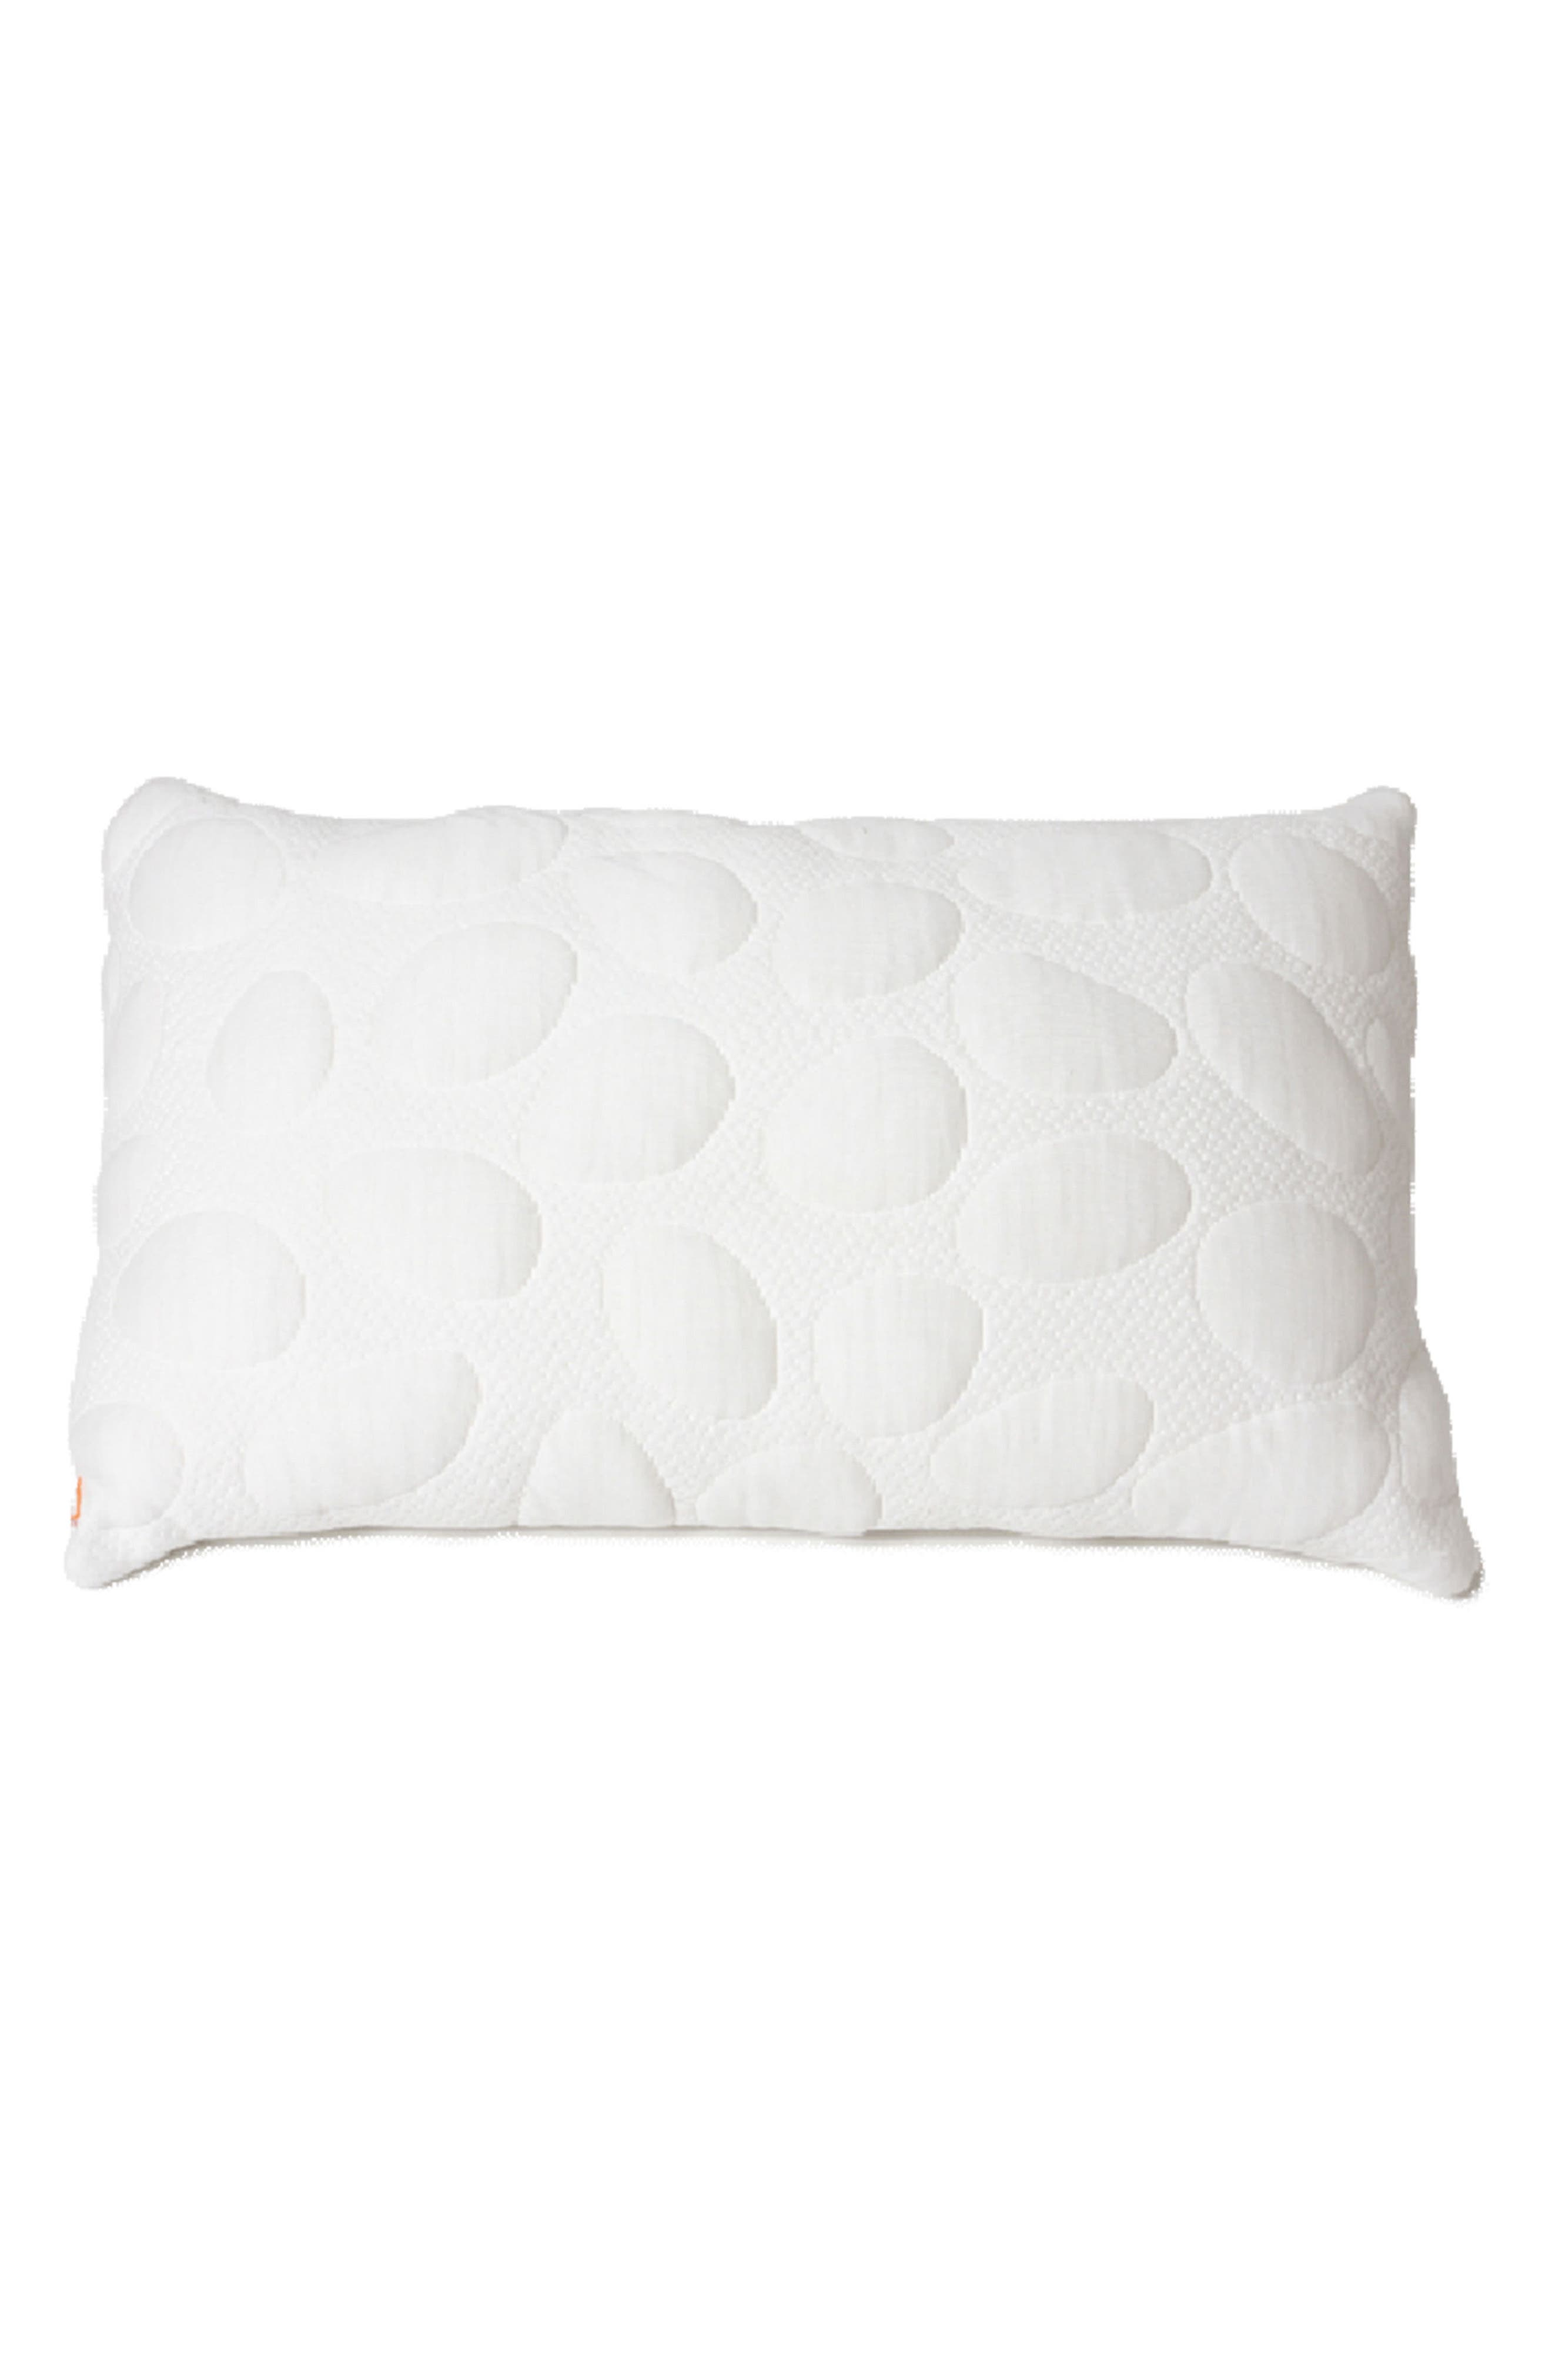 Alternate Image 1 Selected - Nook Pebble Jr. Pillow